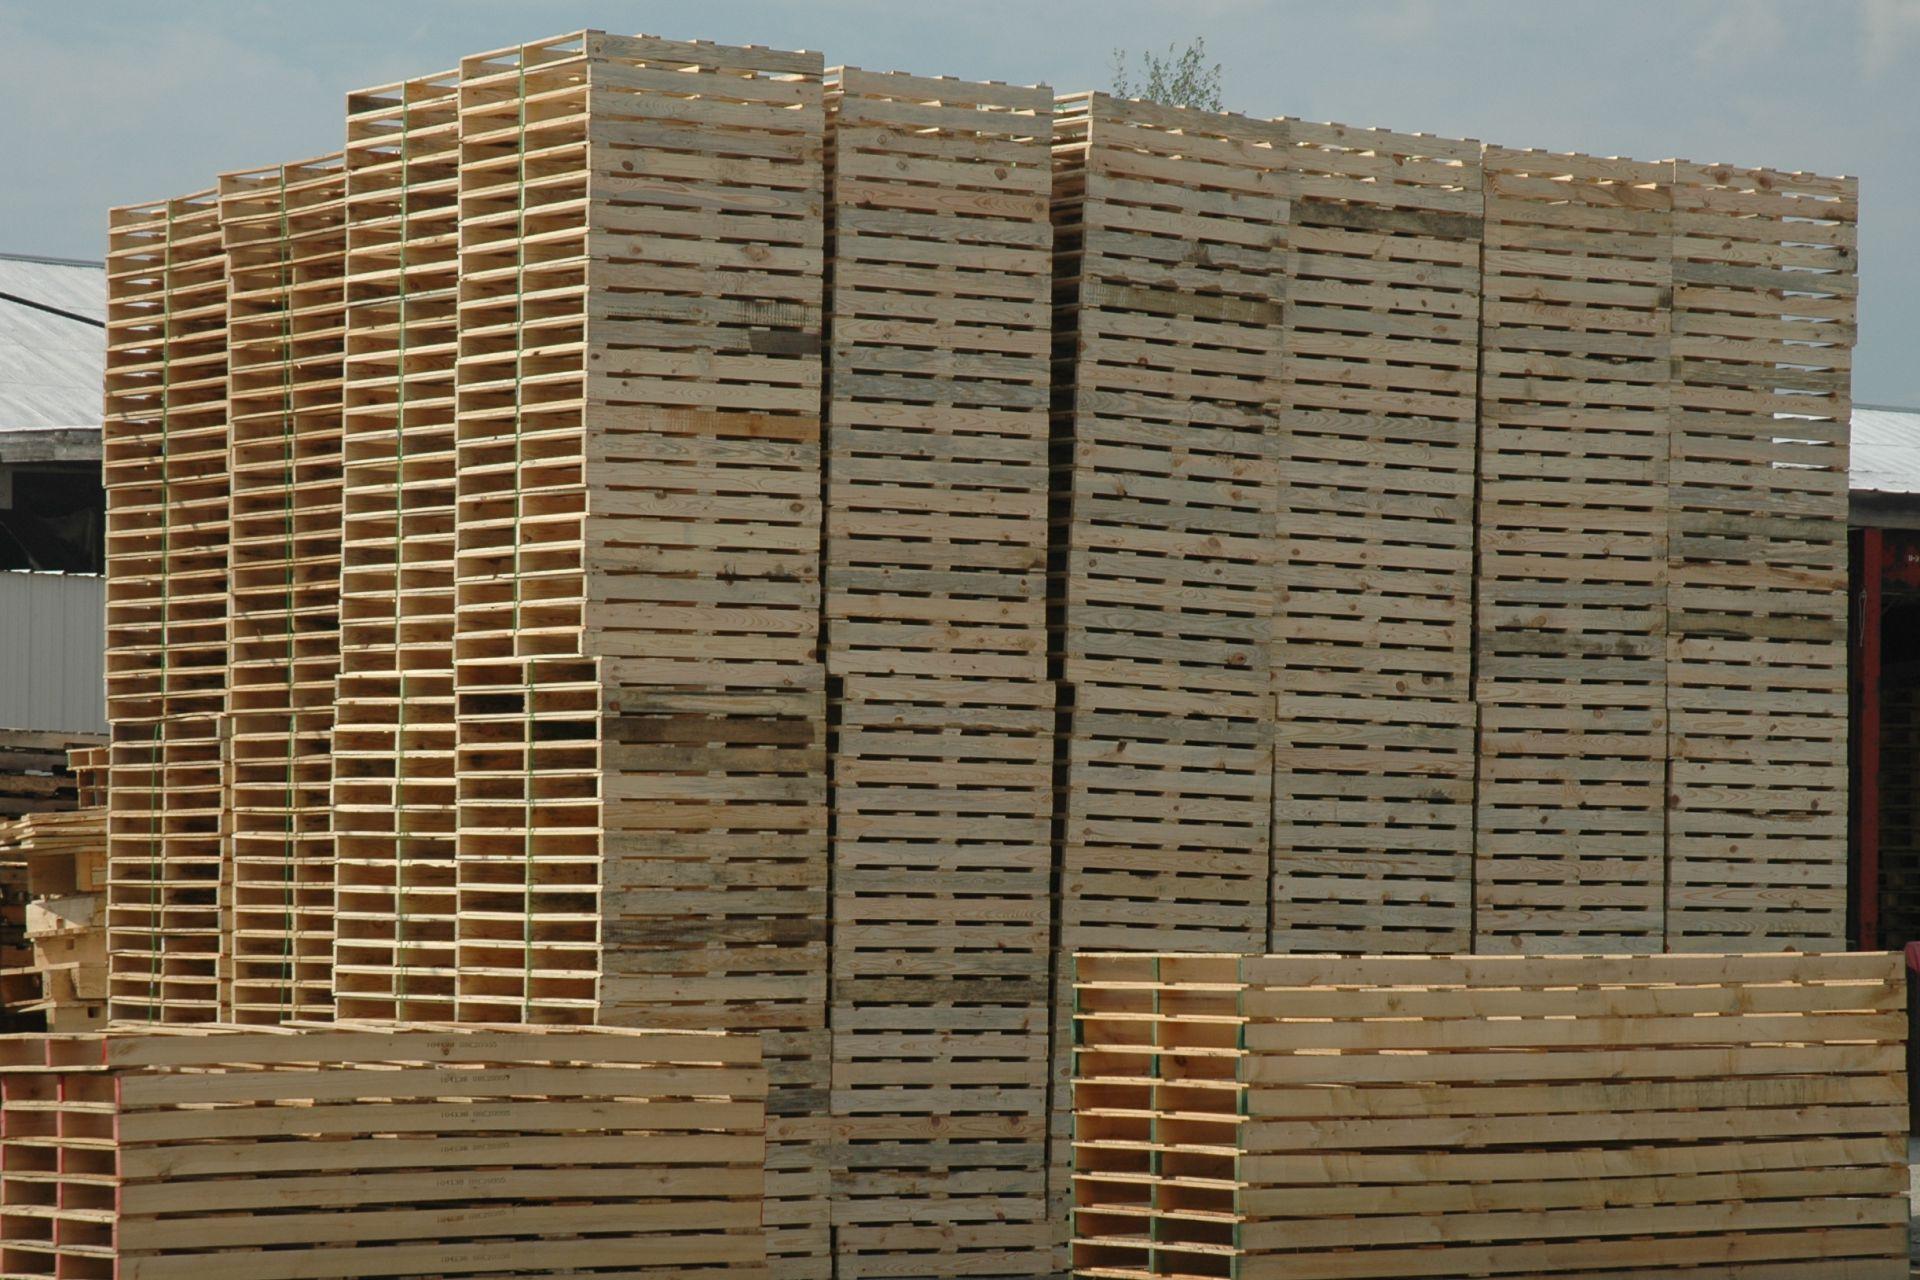 pallet wood 1920